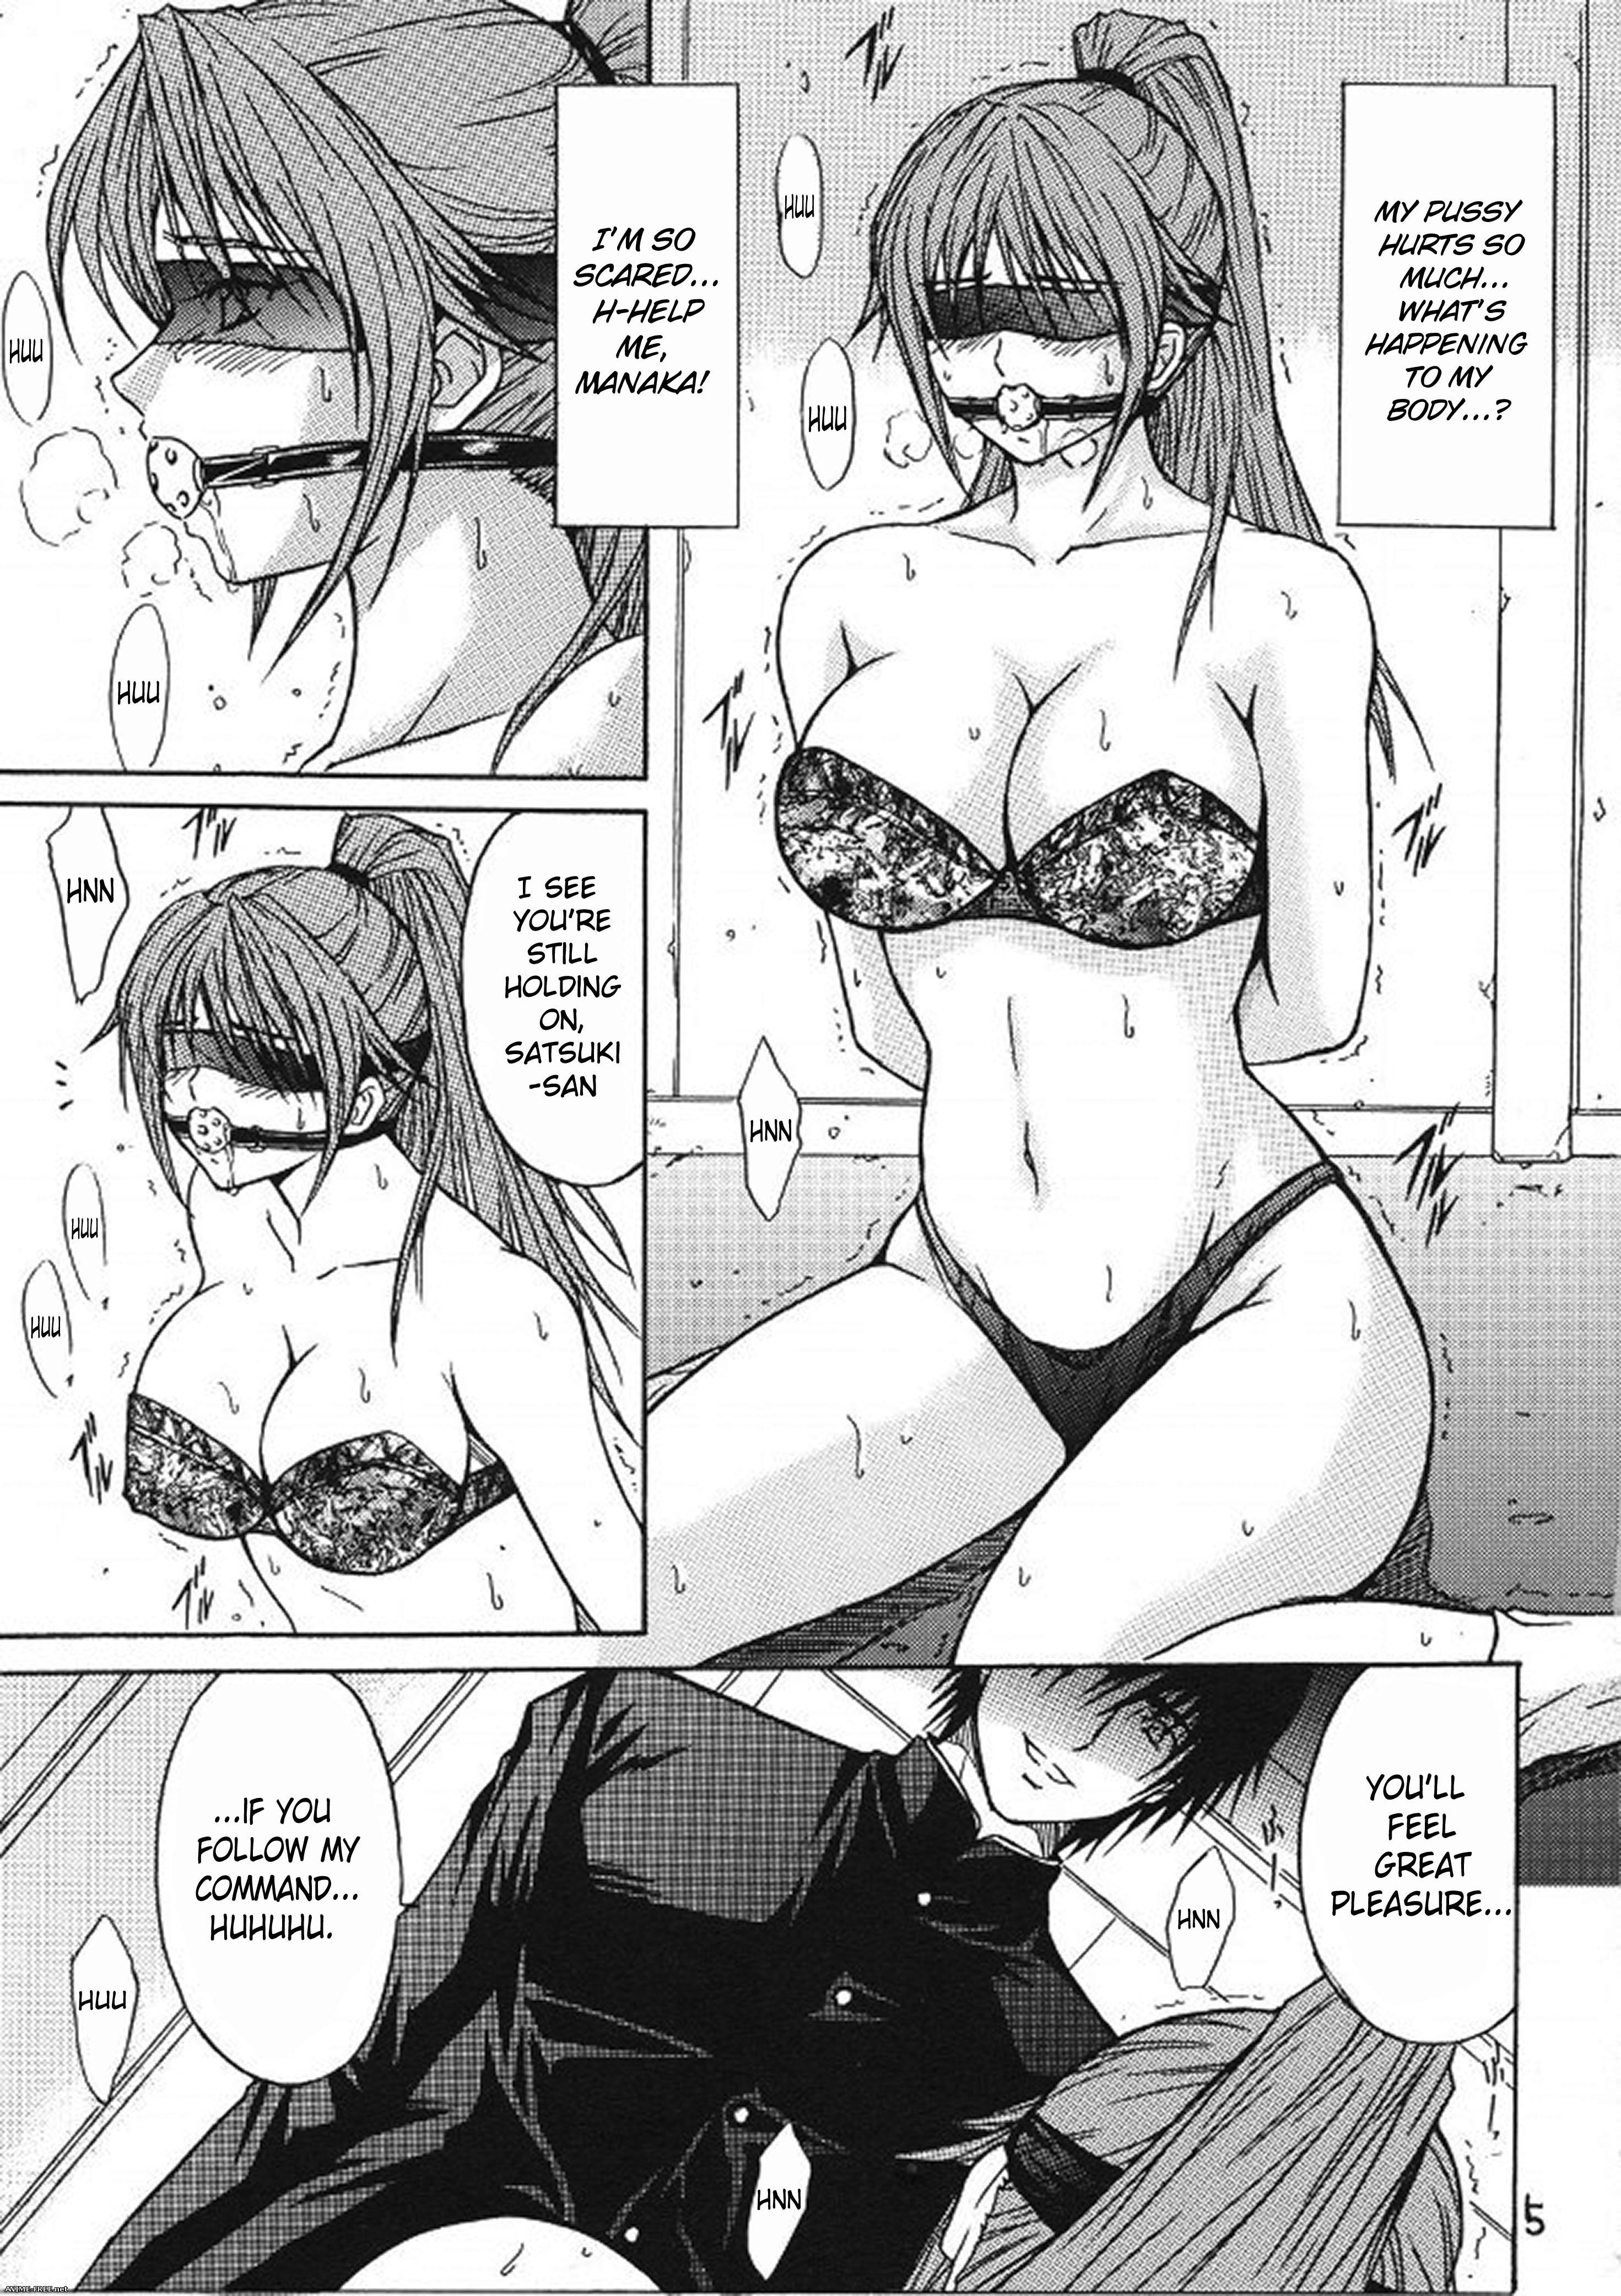 Aoi Mikku(KUSARI) - Сборник хентай манги [Ptcen] [ENG,JAP] Manga Hentai